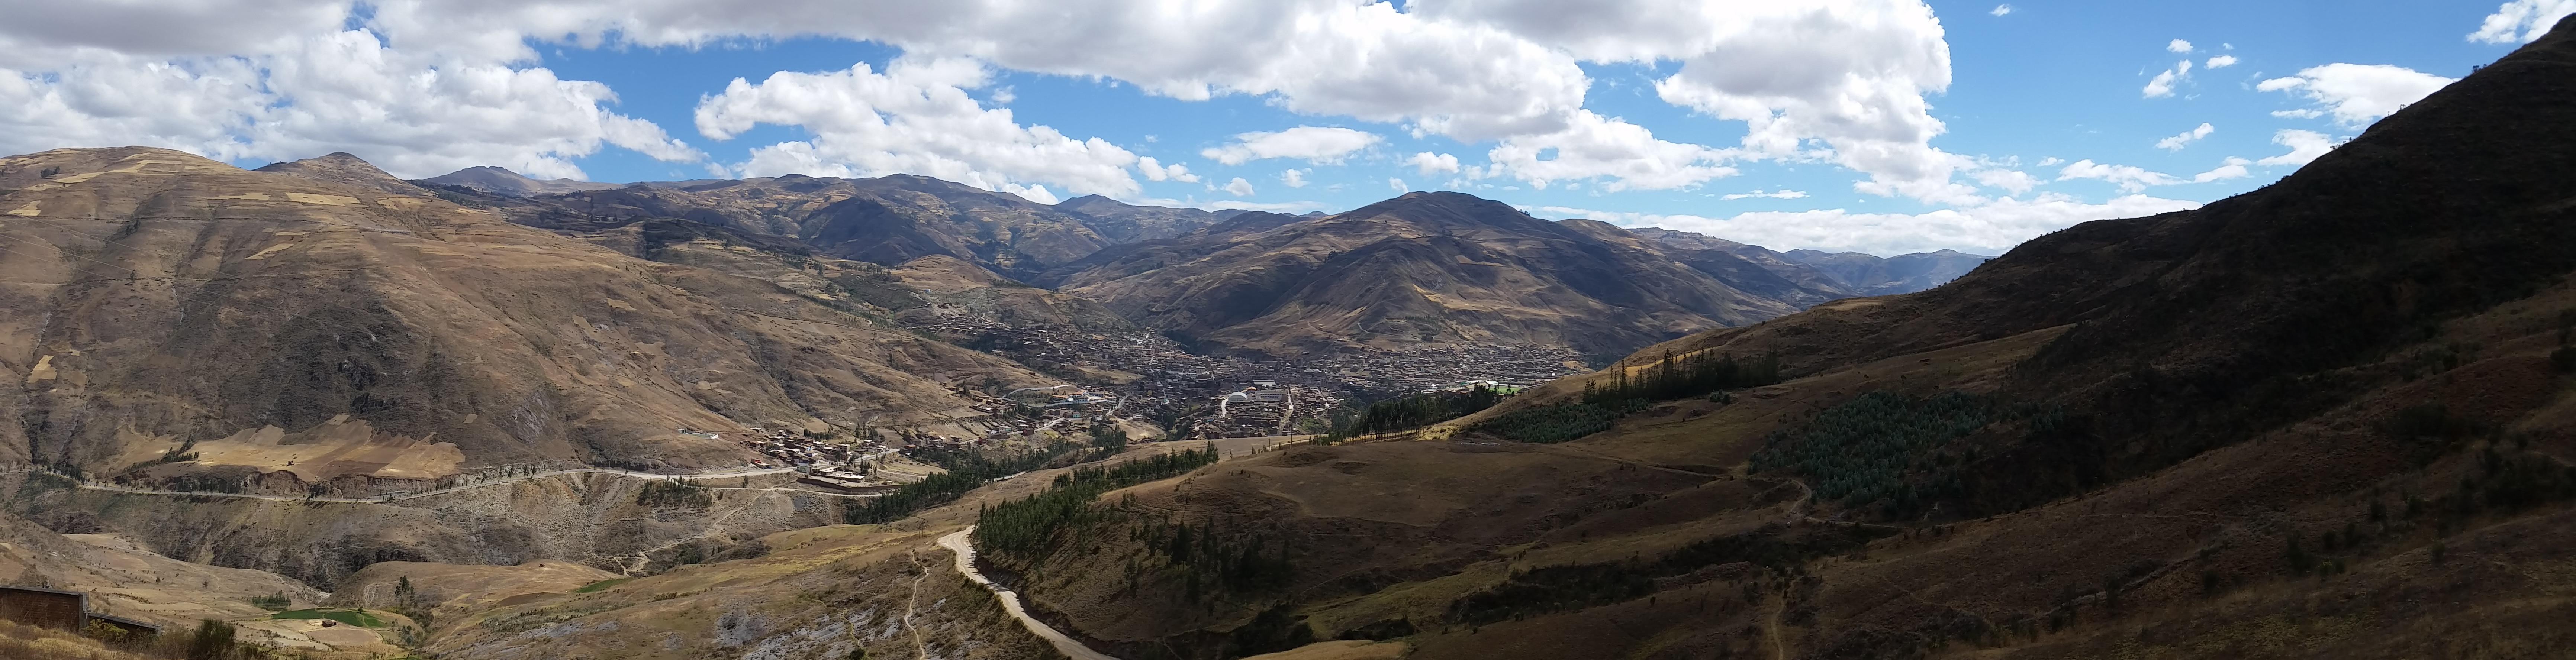 Otuzco, Peru